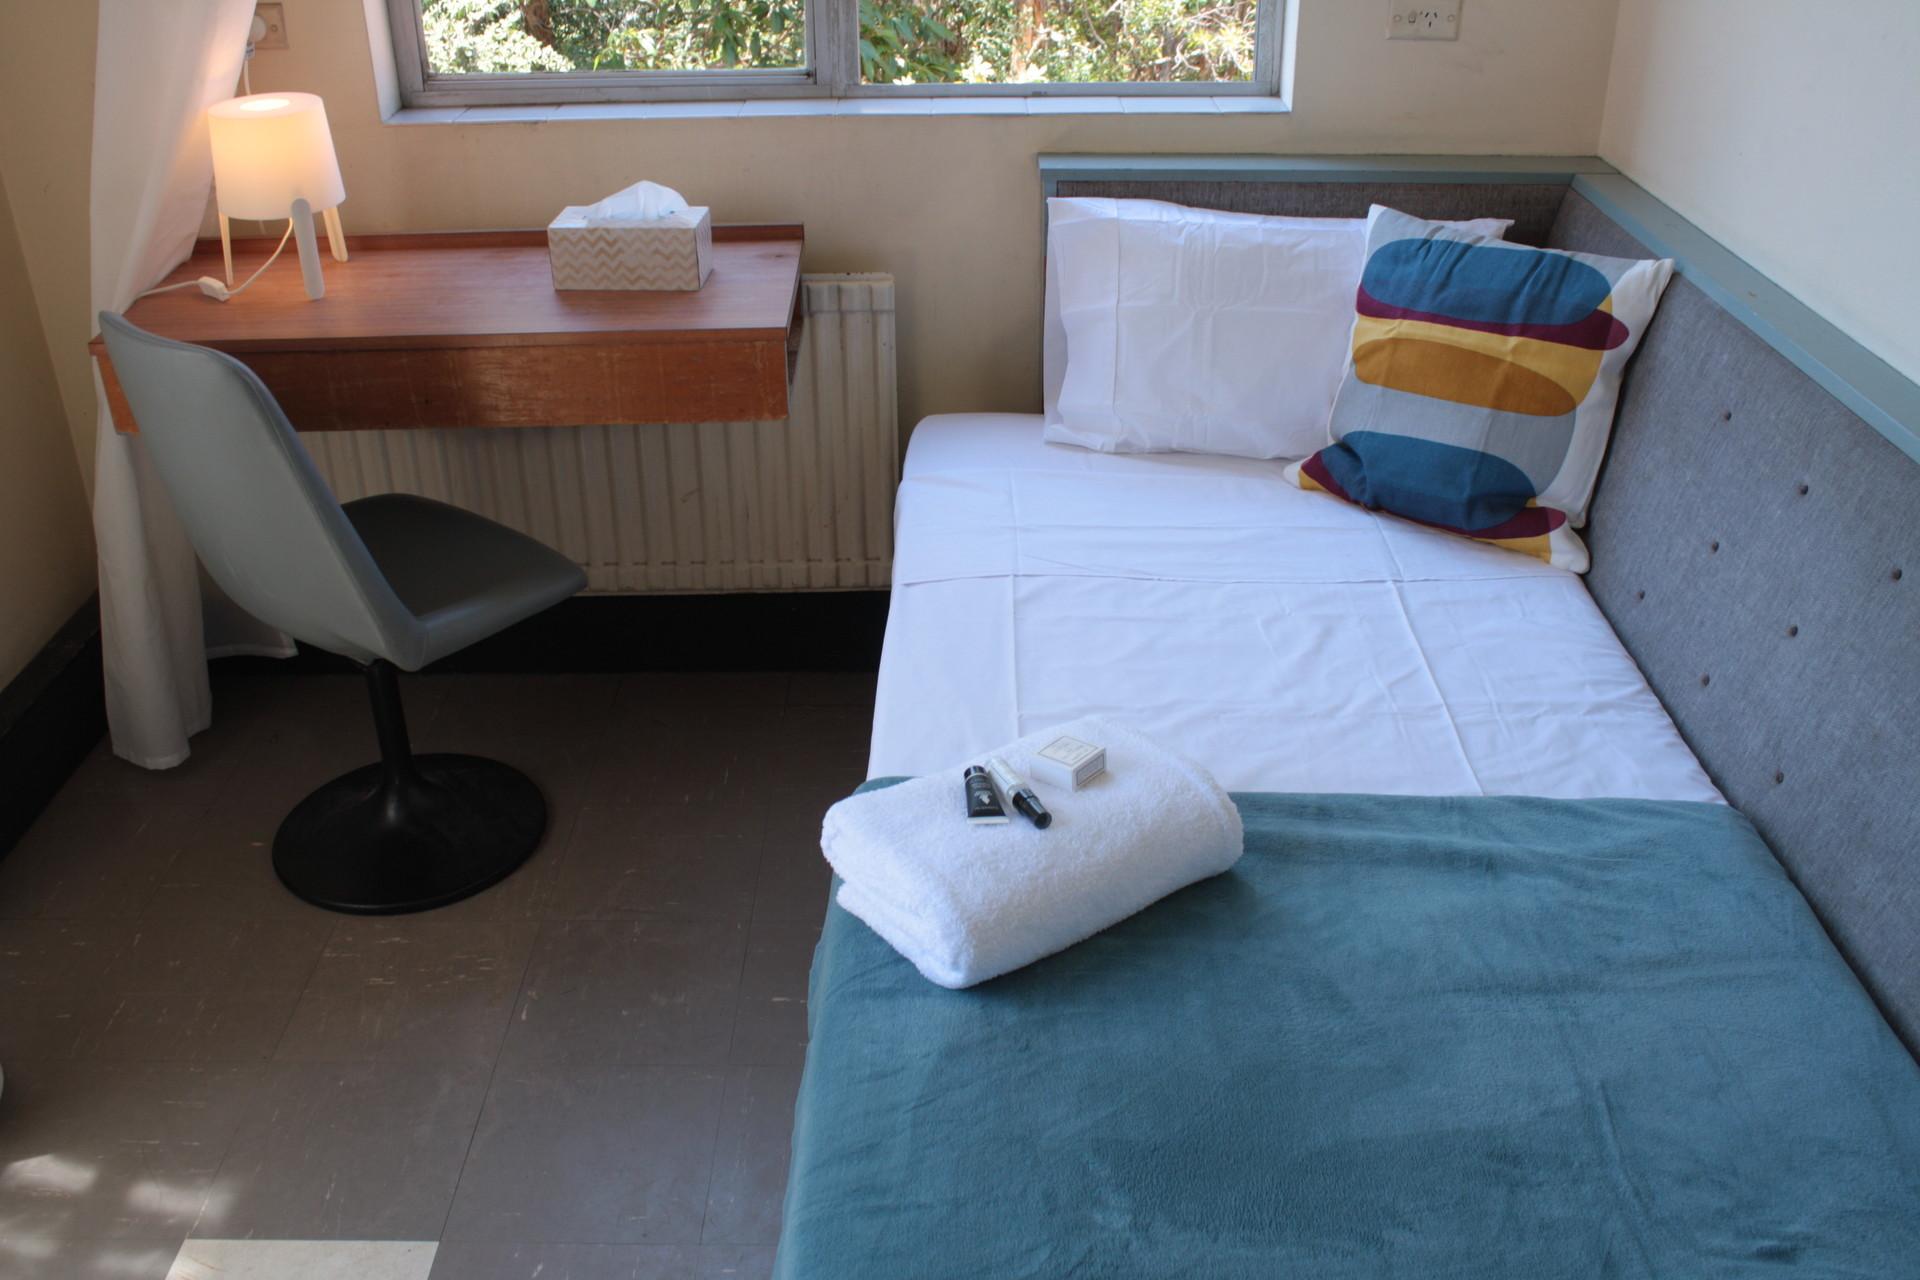 greenwich-village-accommodation-9a594749899d96a28243aff46494199d